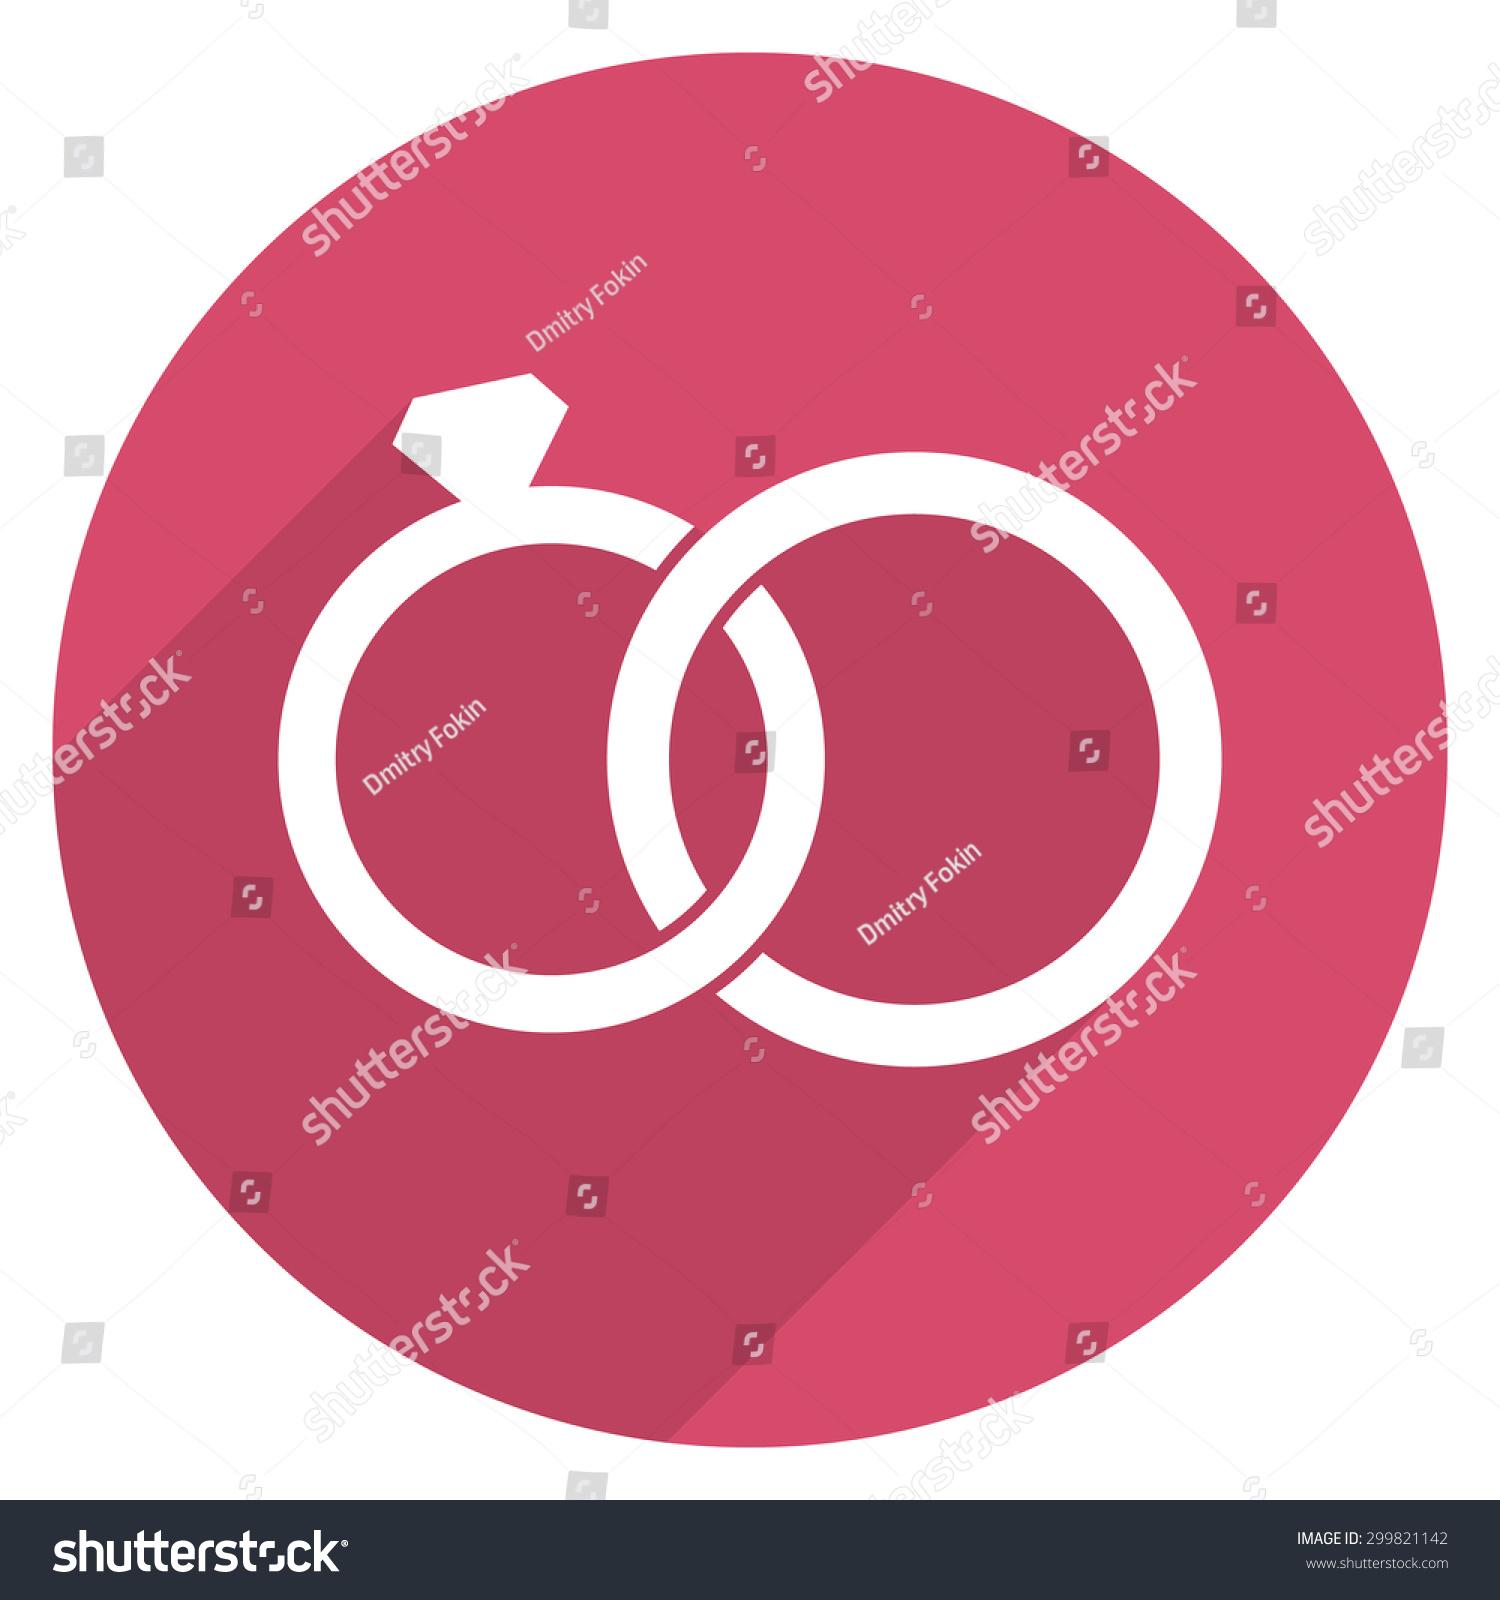 Wedding Rings Icon Modern Minimal Flat Stock Vector 299821142 ...